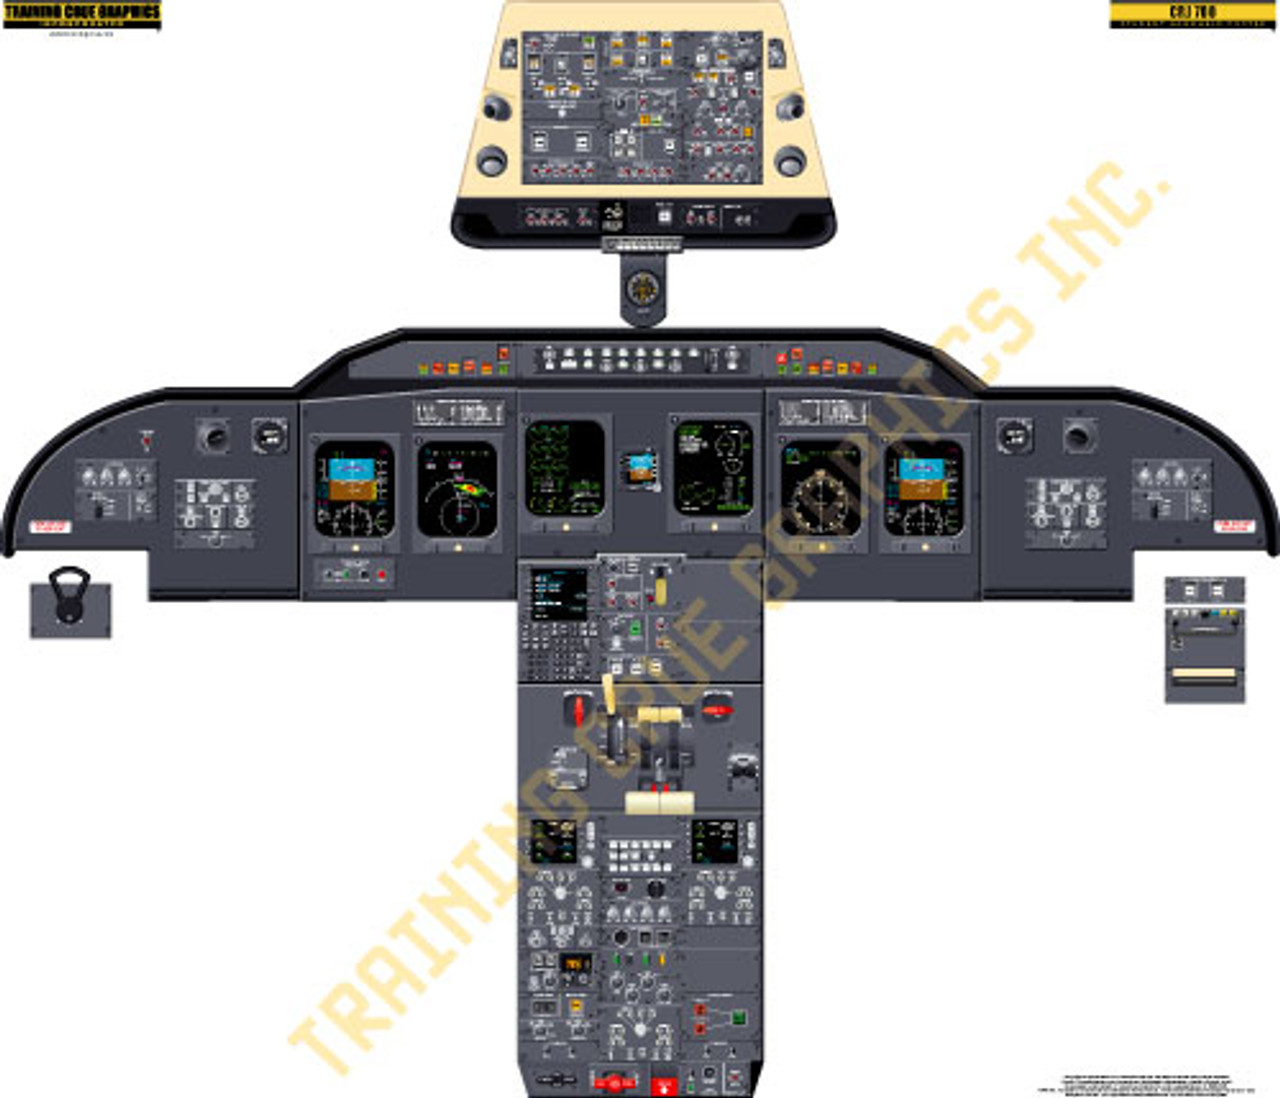 Bombardier CRJ 700/705/900 Poster